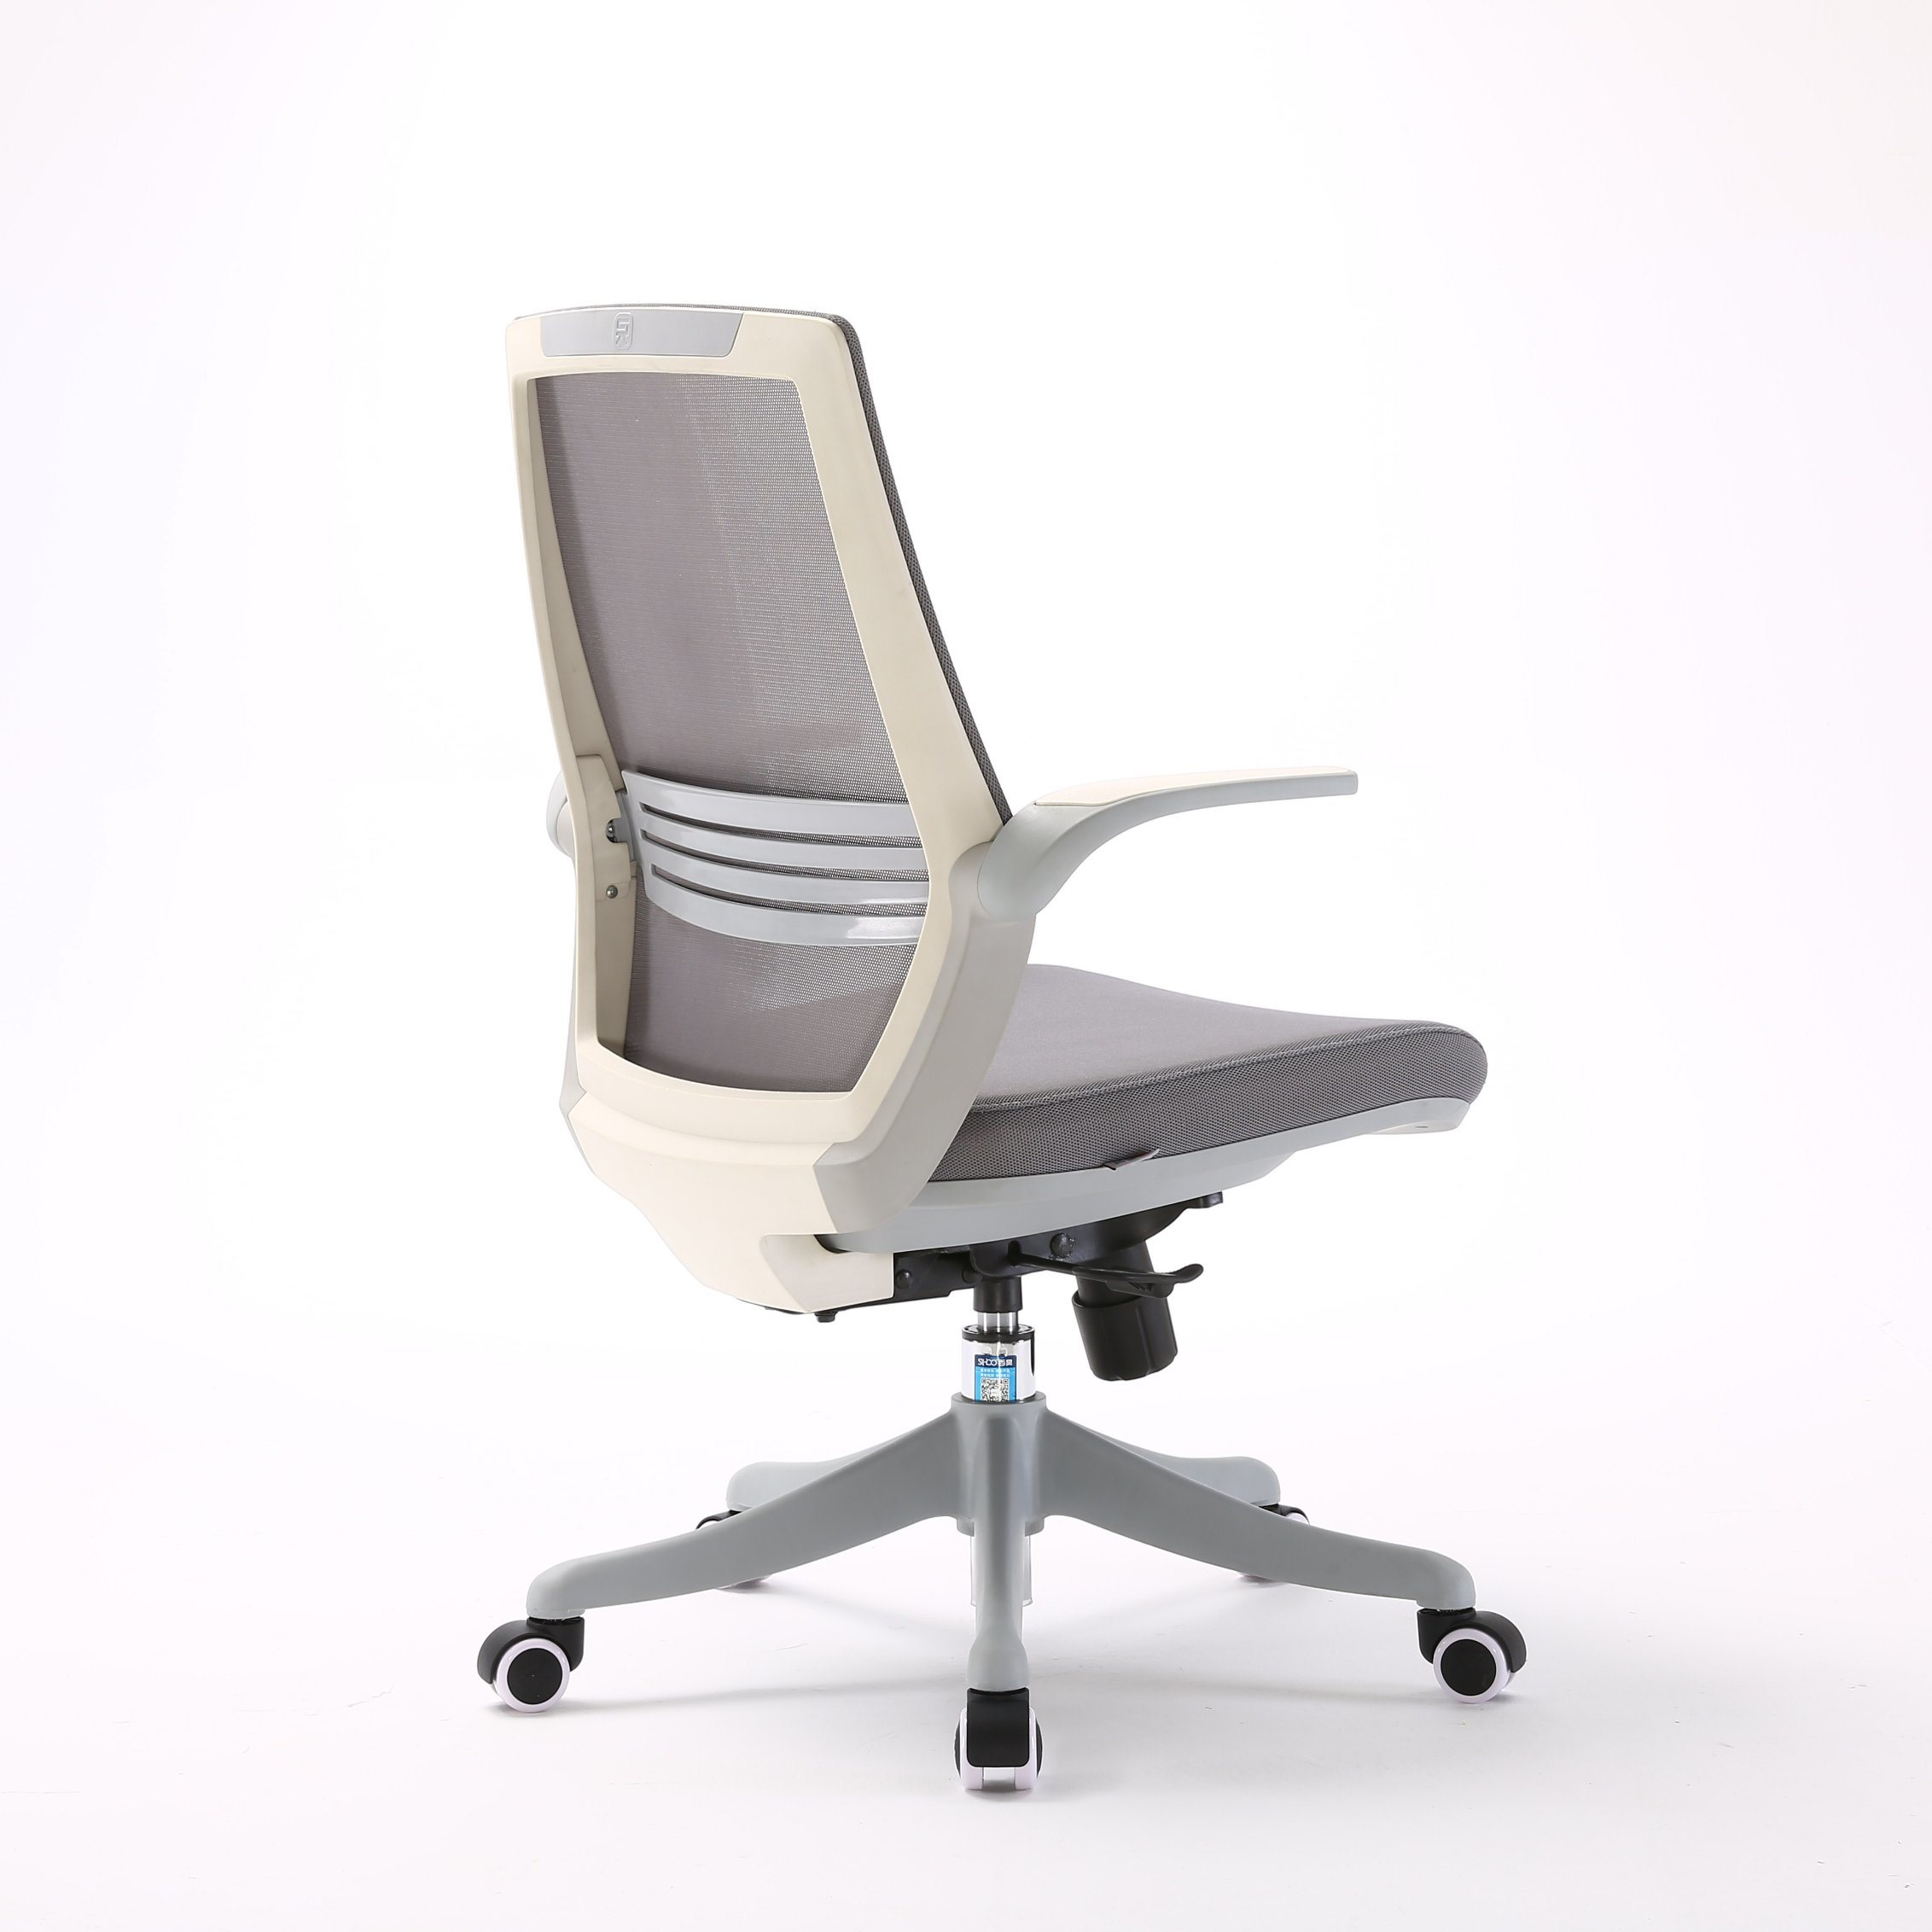 Adjule Angle Headrest Support